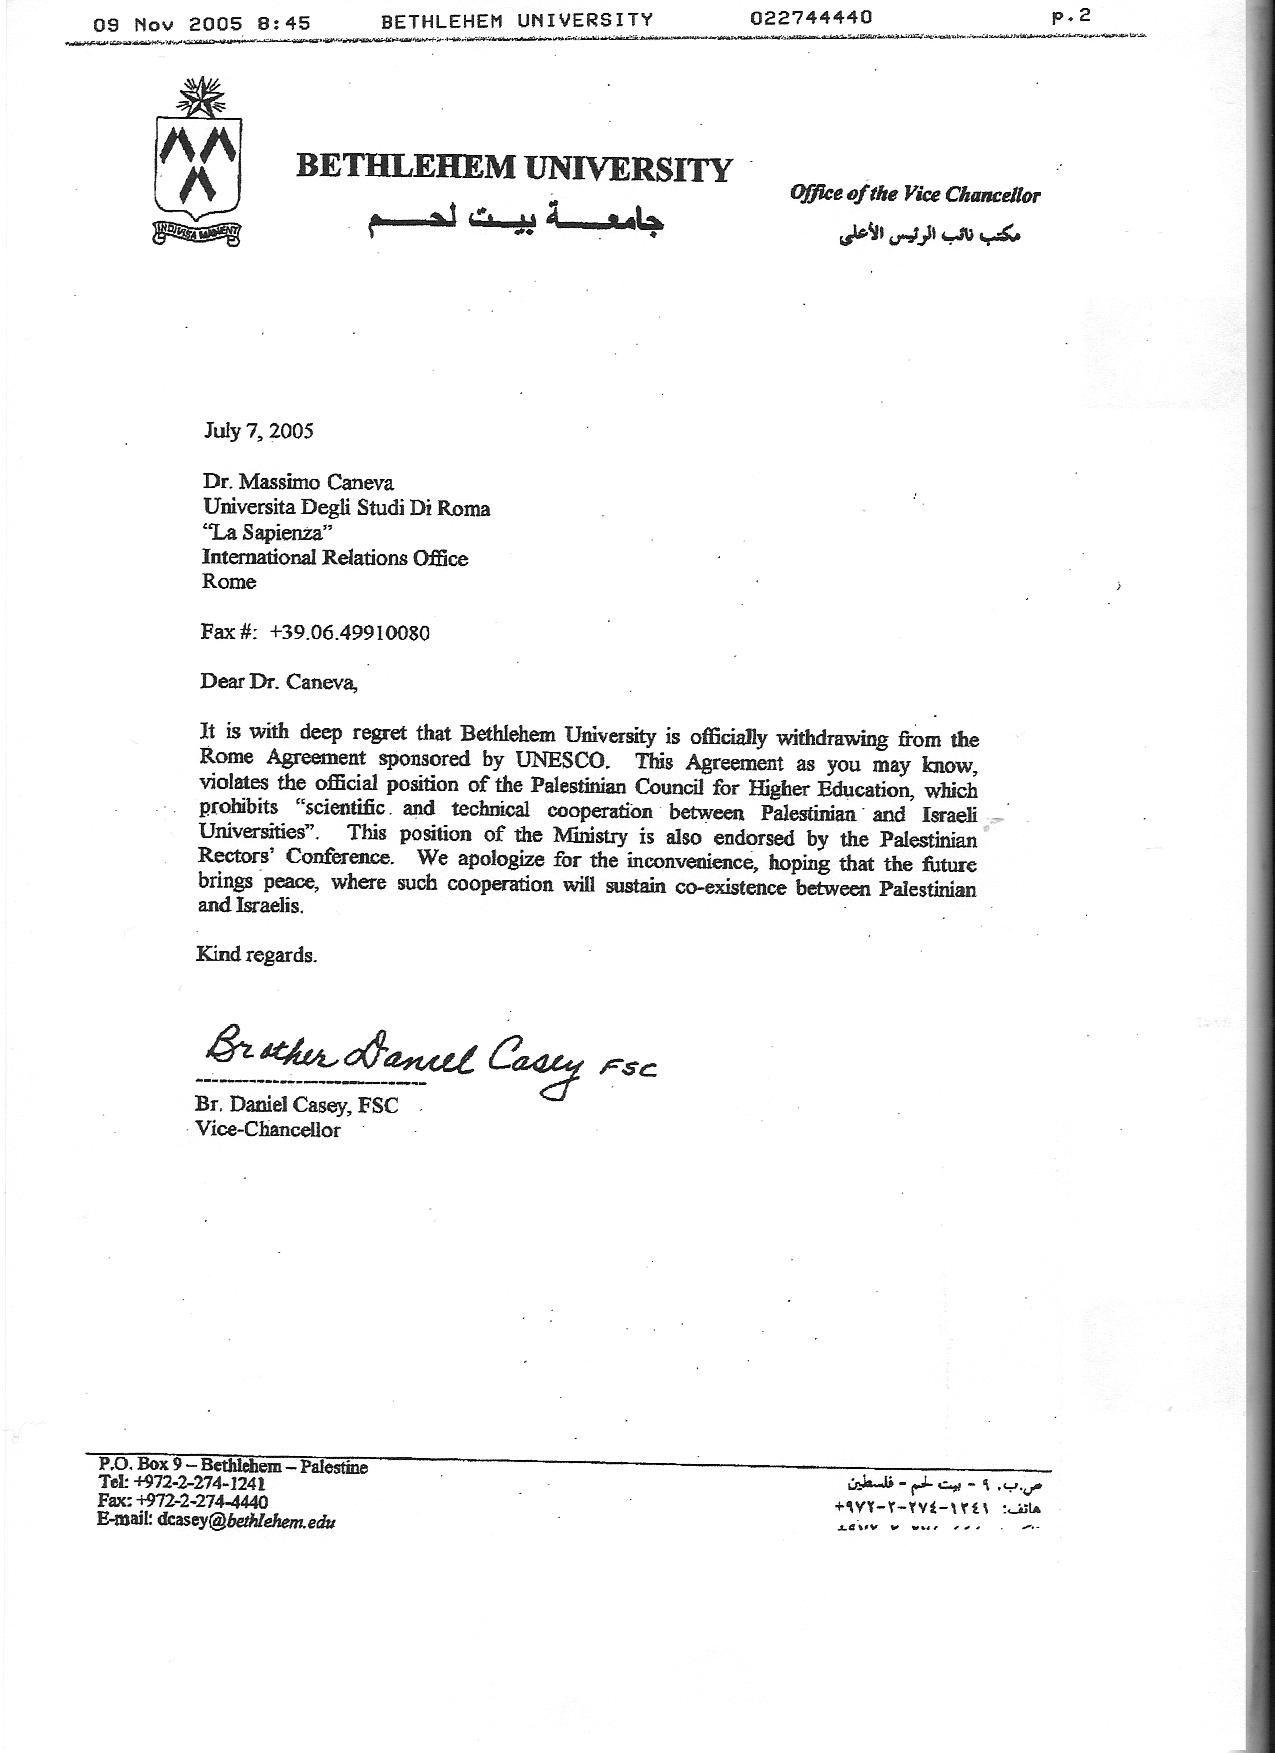 Images For Official Request Letter Formatofficial Letter Business Letter  Sample